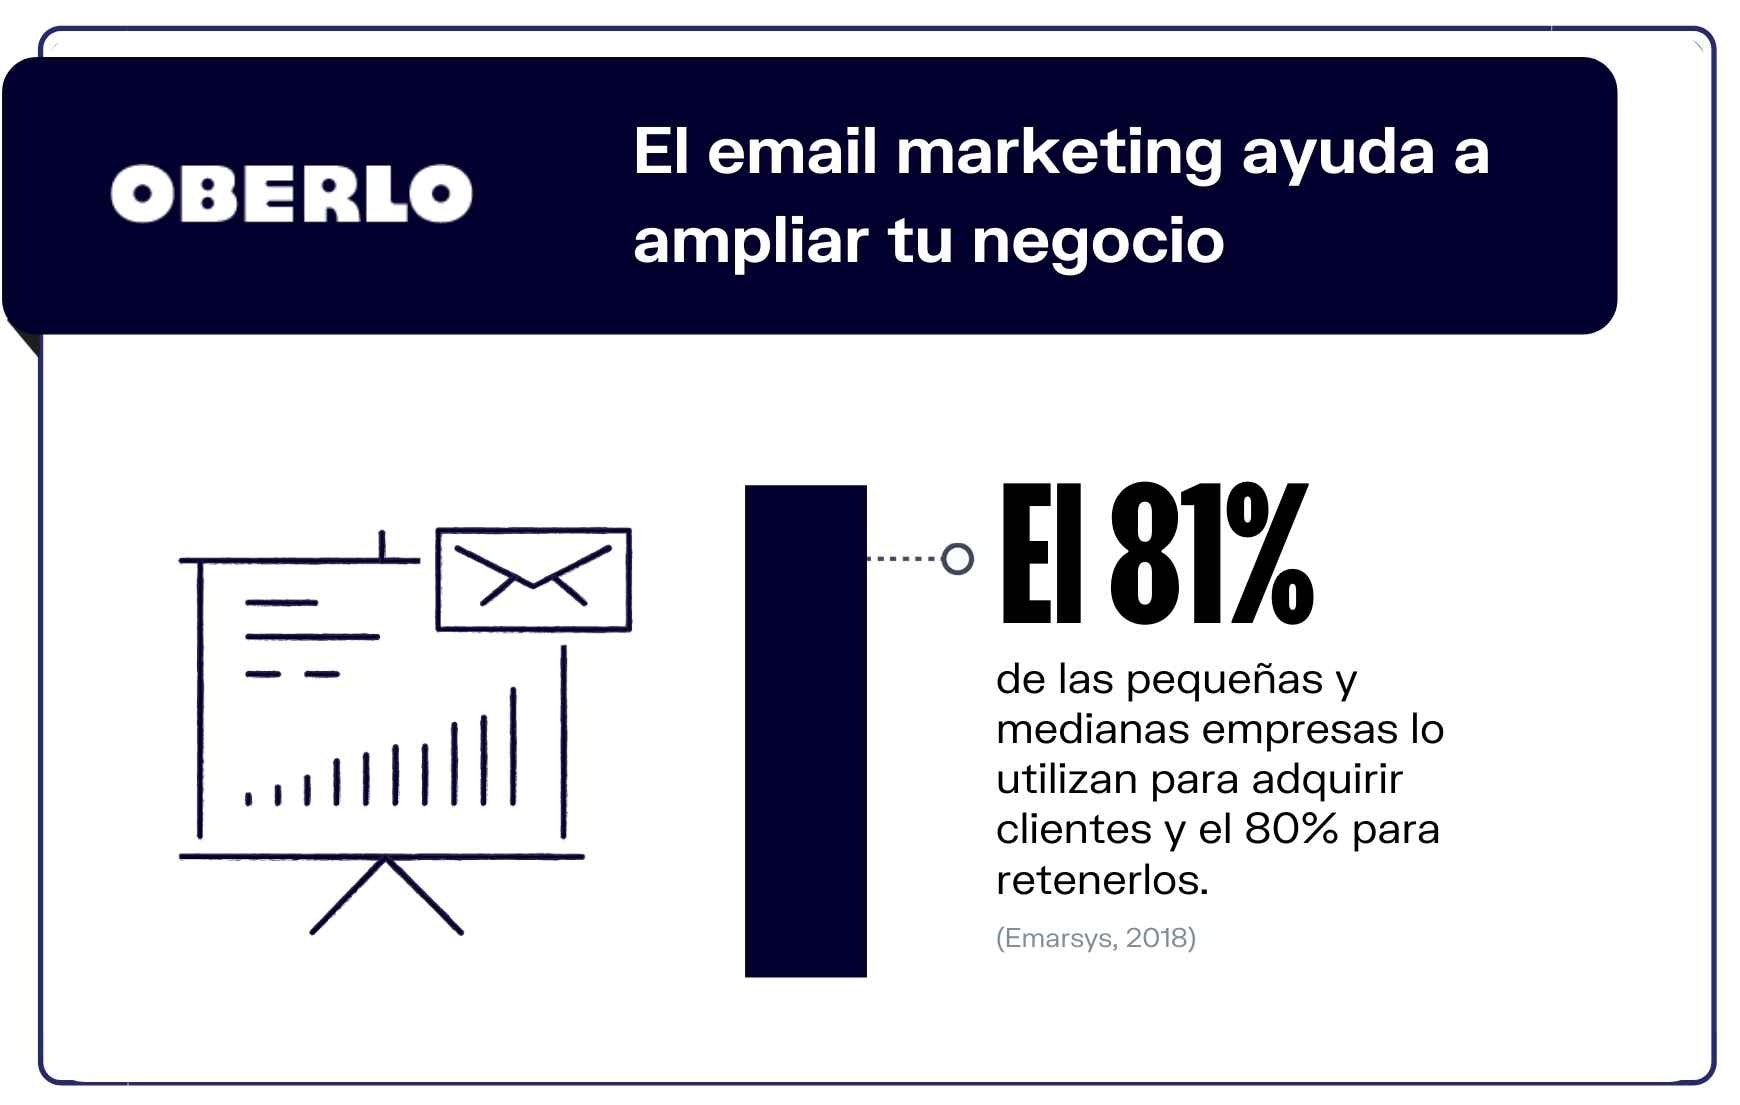 Datos de marketing por correo electrónico